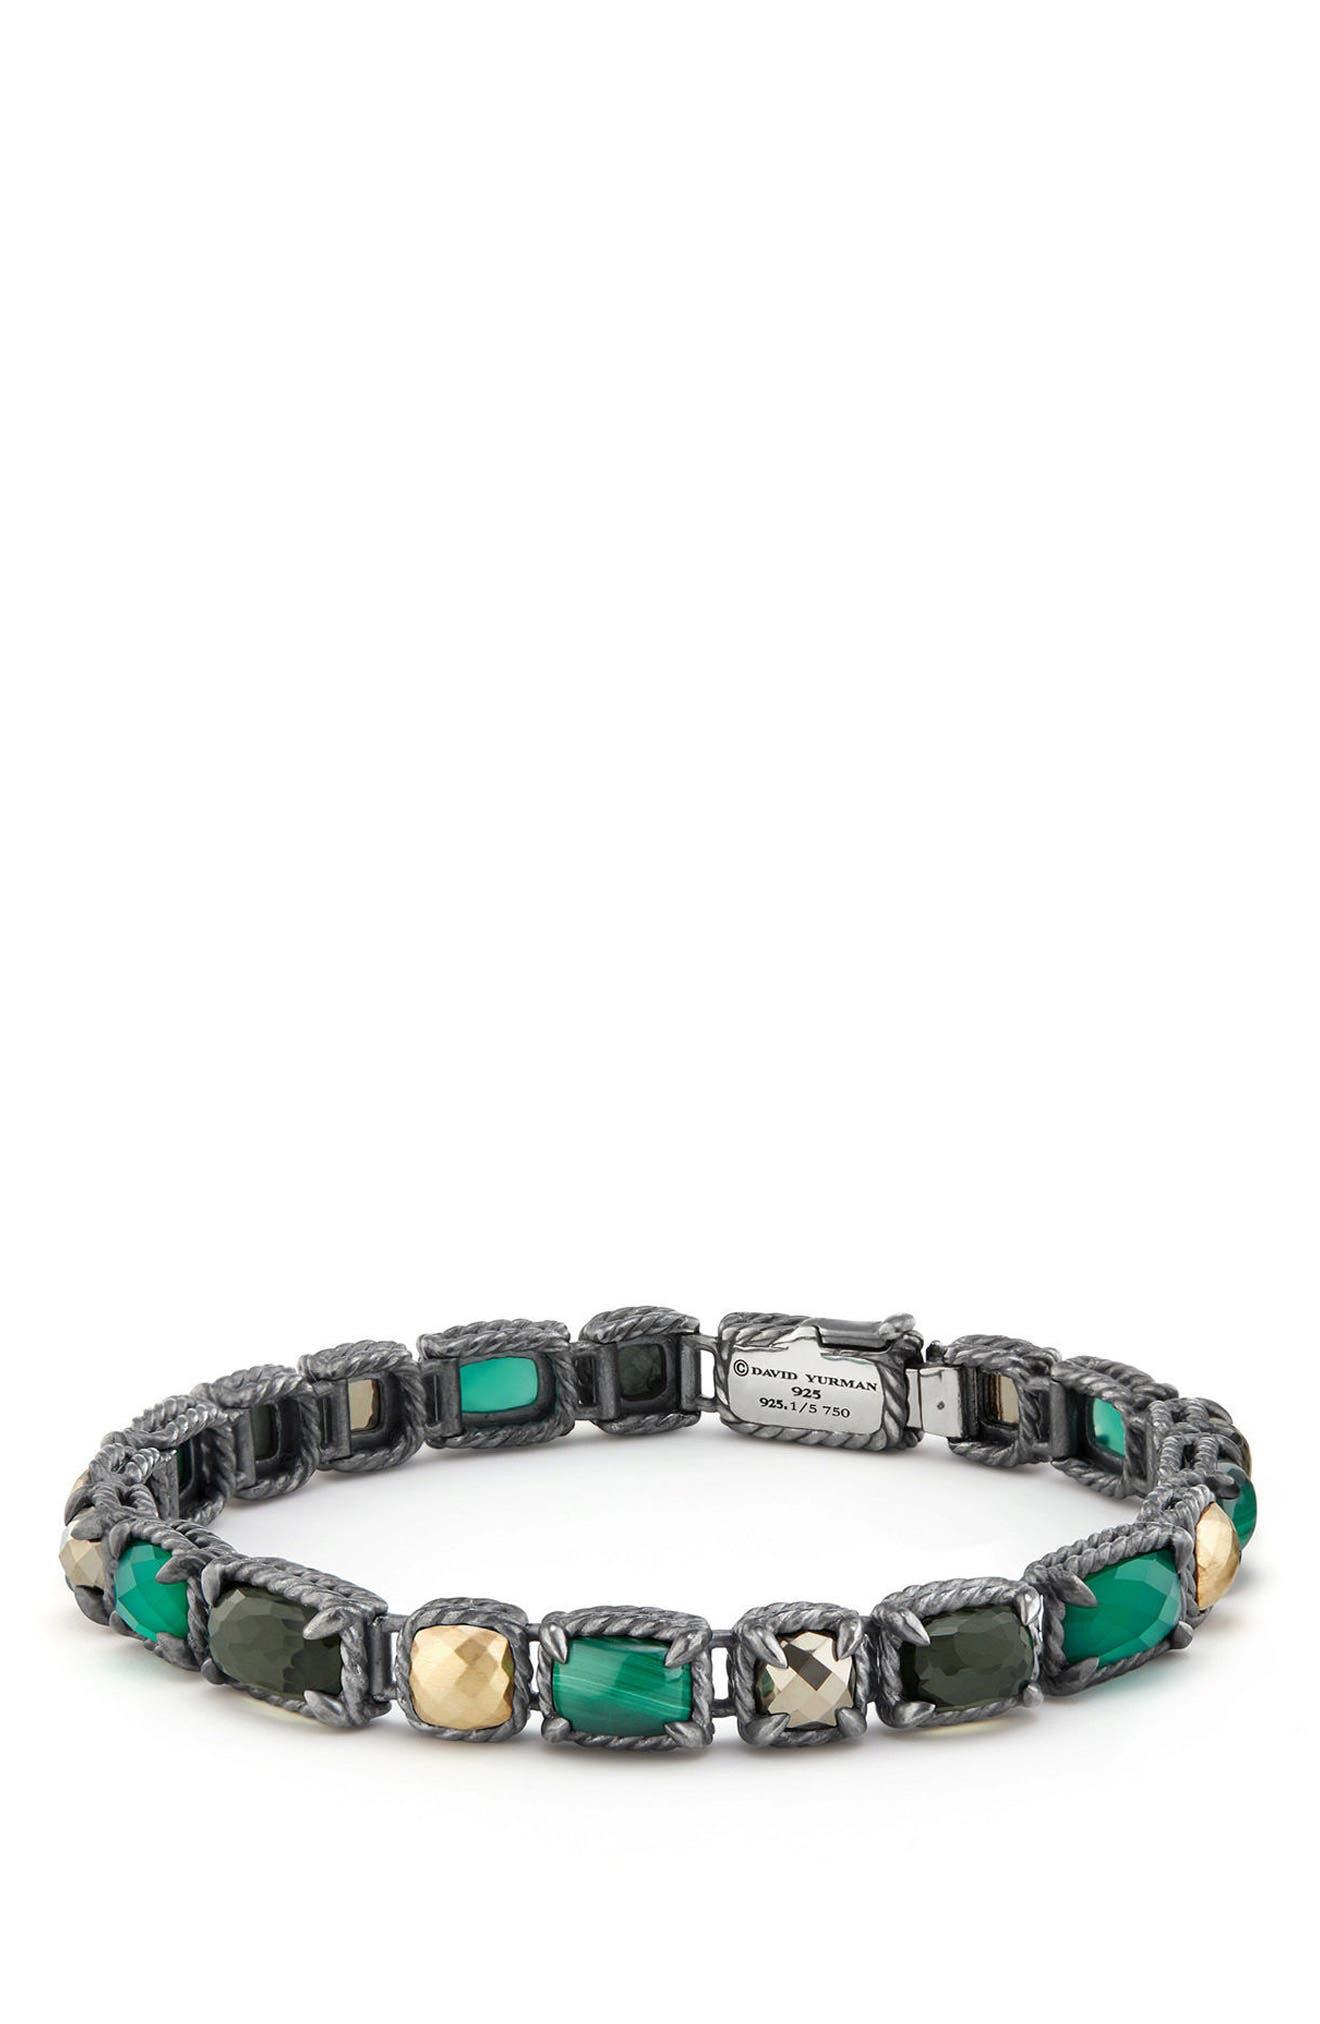 Main Image - David Yurman Châtelaine Mosaic Tennis Bracelet with 18K Gold